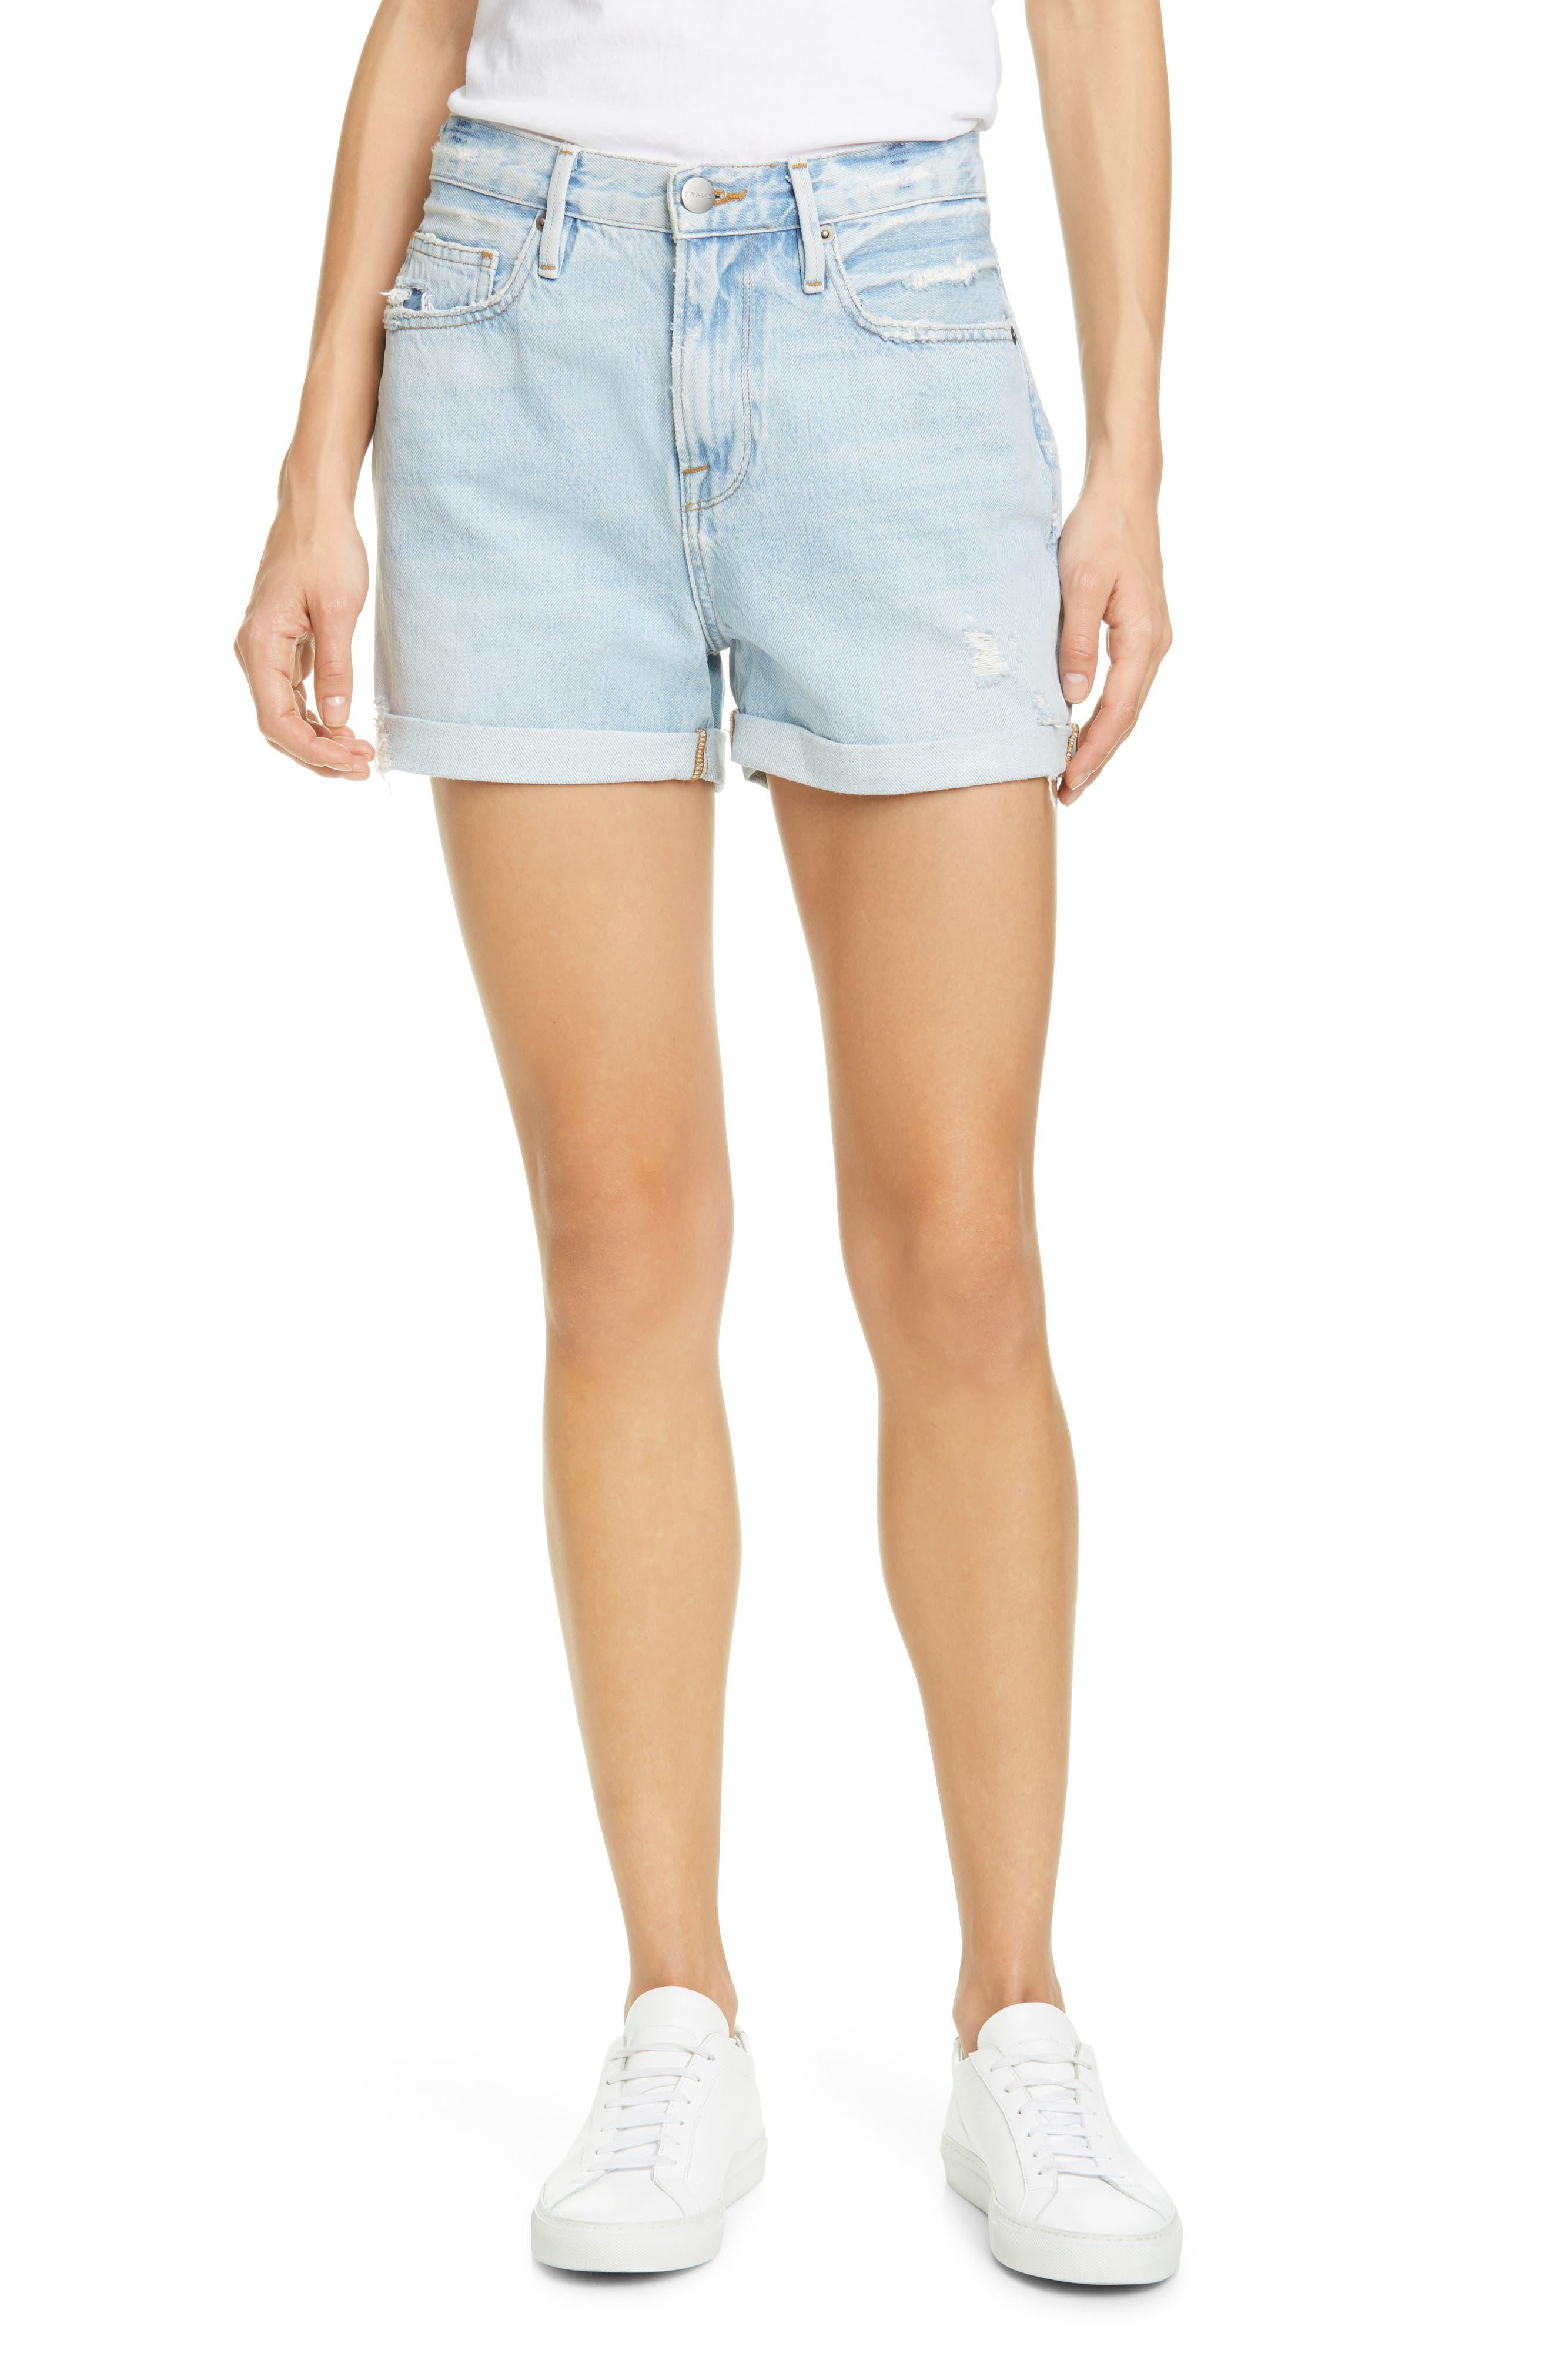 Women's Frame Le Beau Distressed High Waist Denim Shorts